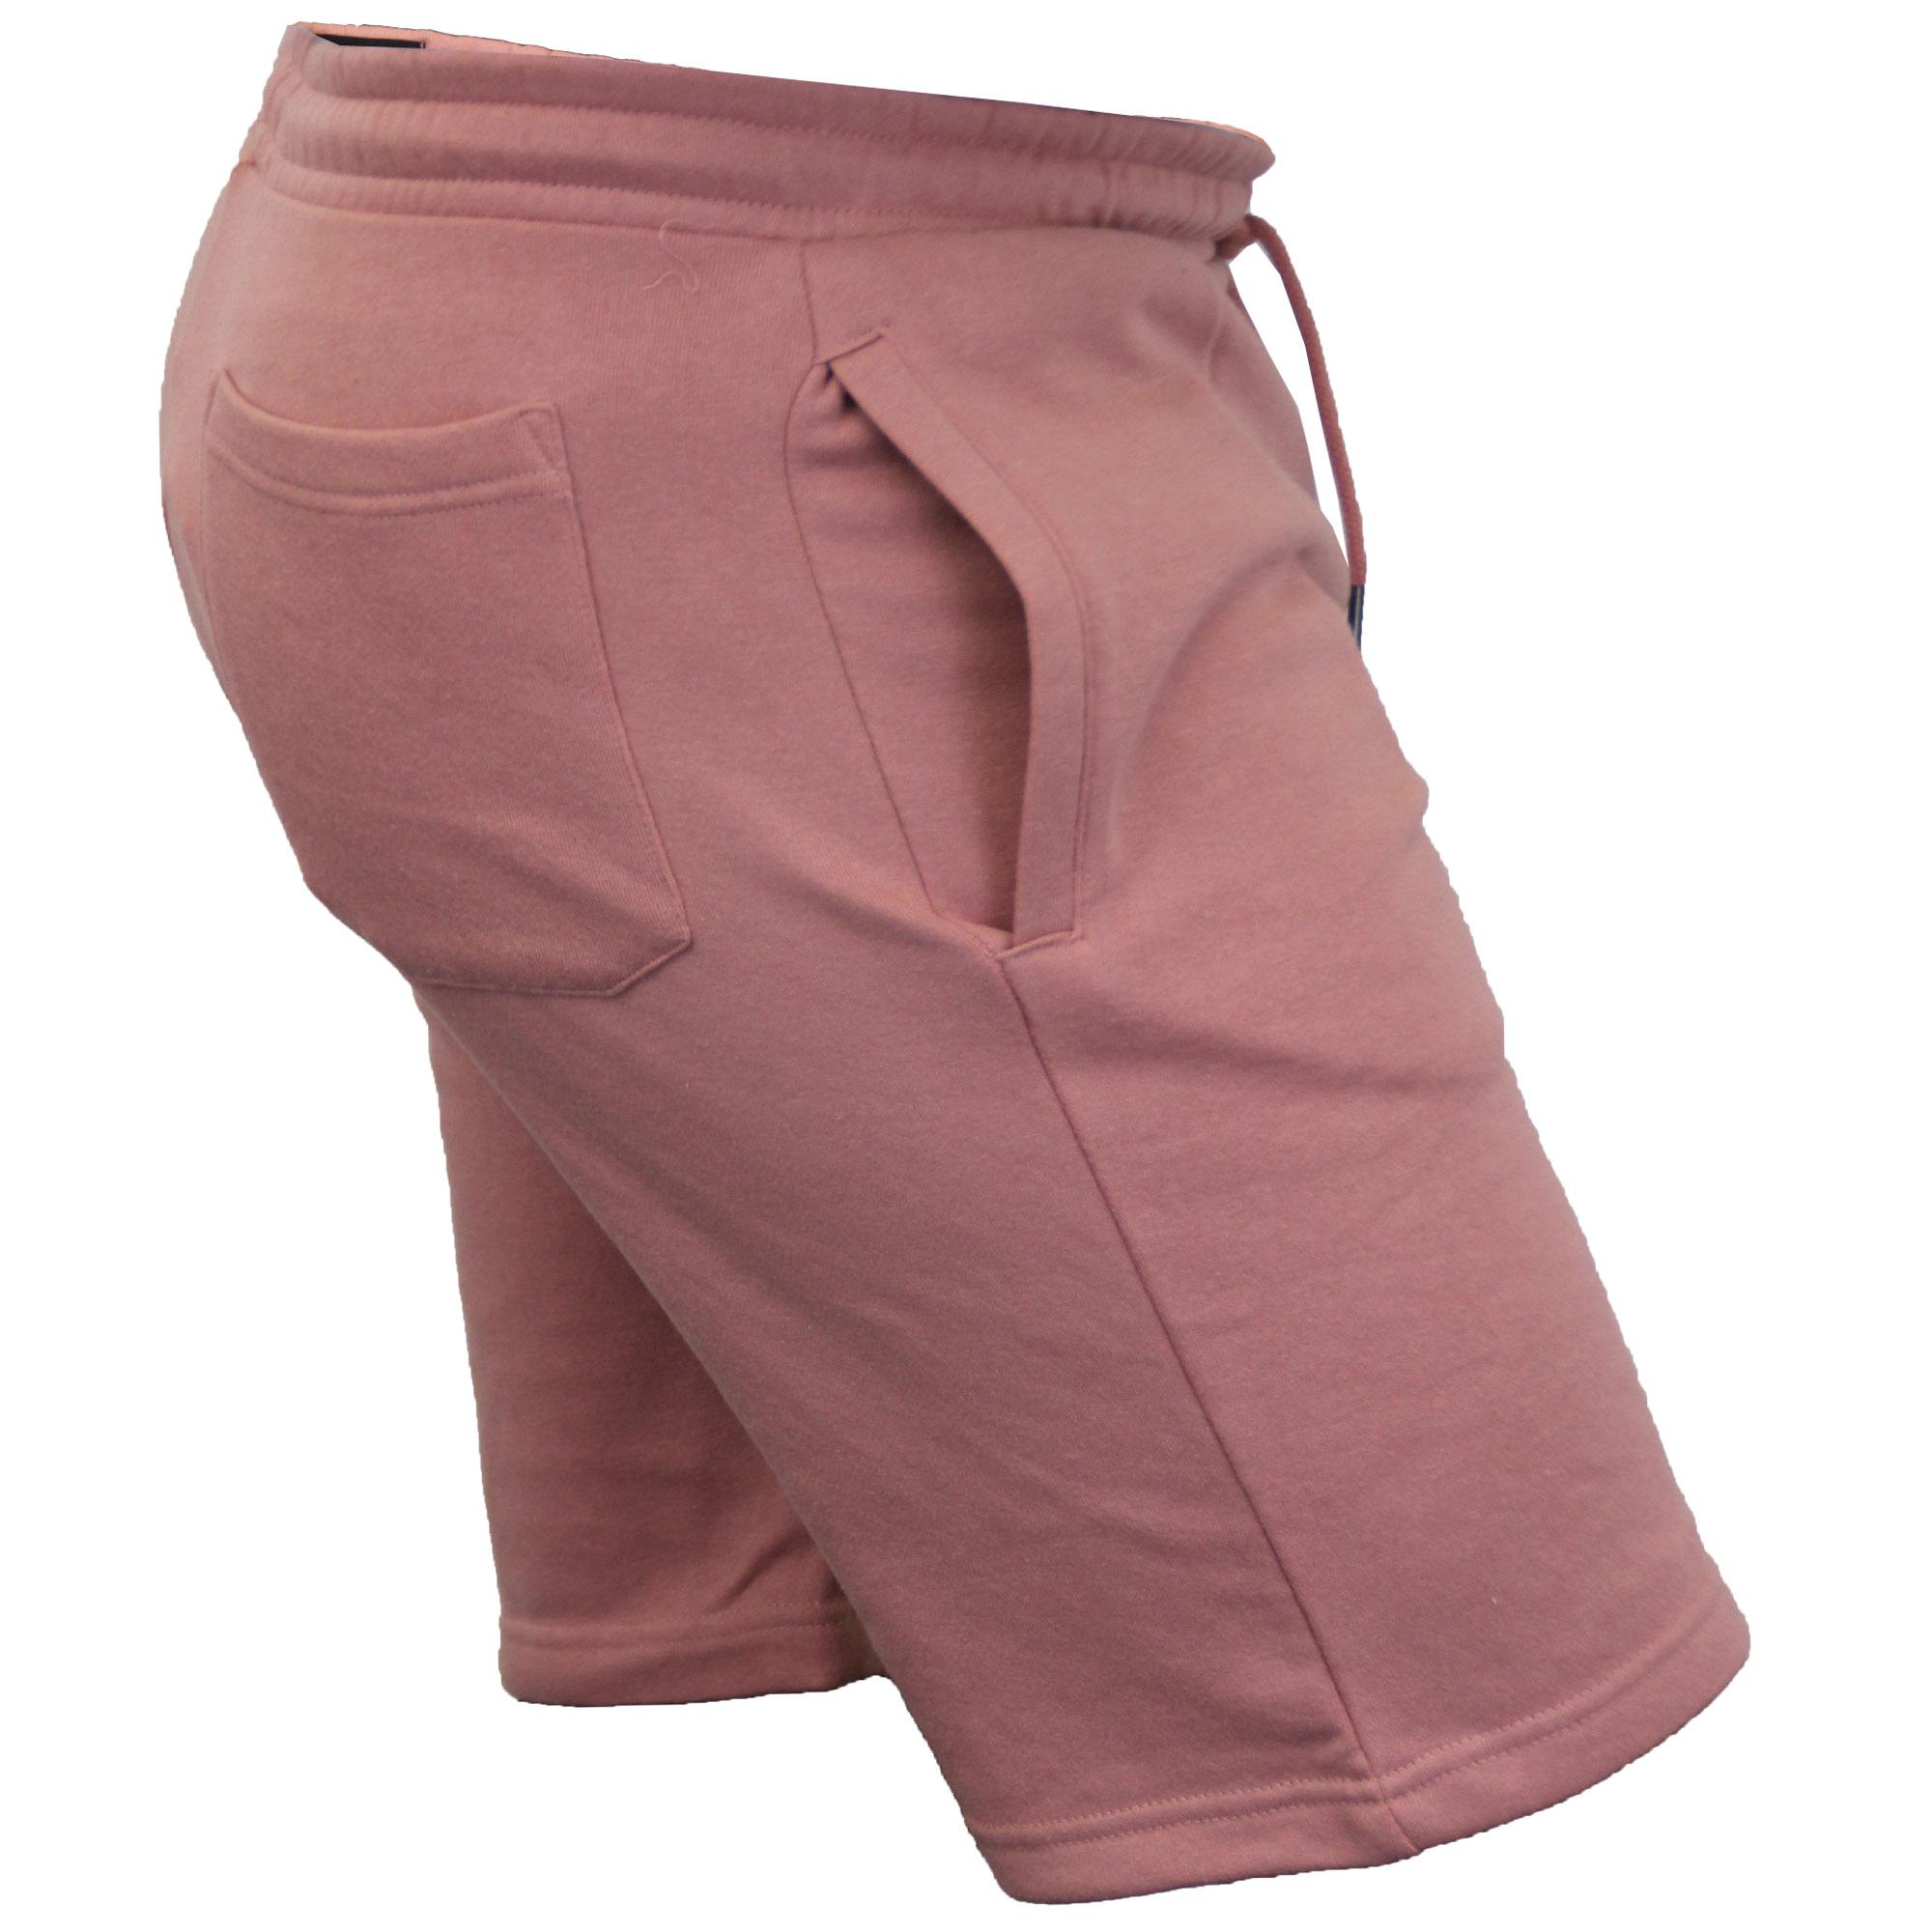 Mens-Jogger-Shorts-Tarley-by-Brave-Soul-Knee-Length-Casual-Fleece-Lined-Summer thumbnail 46